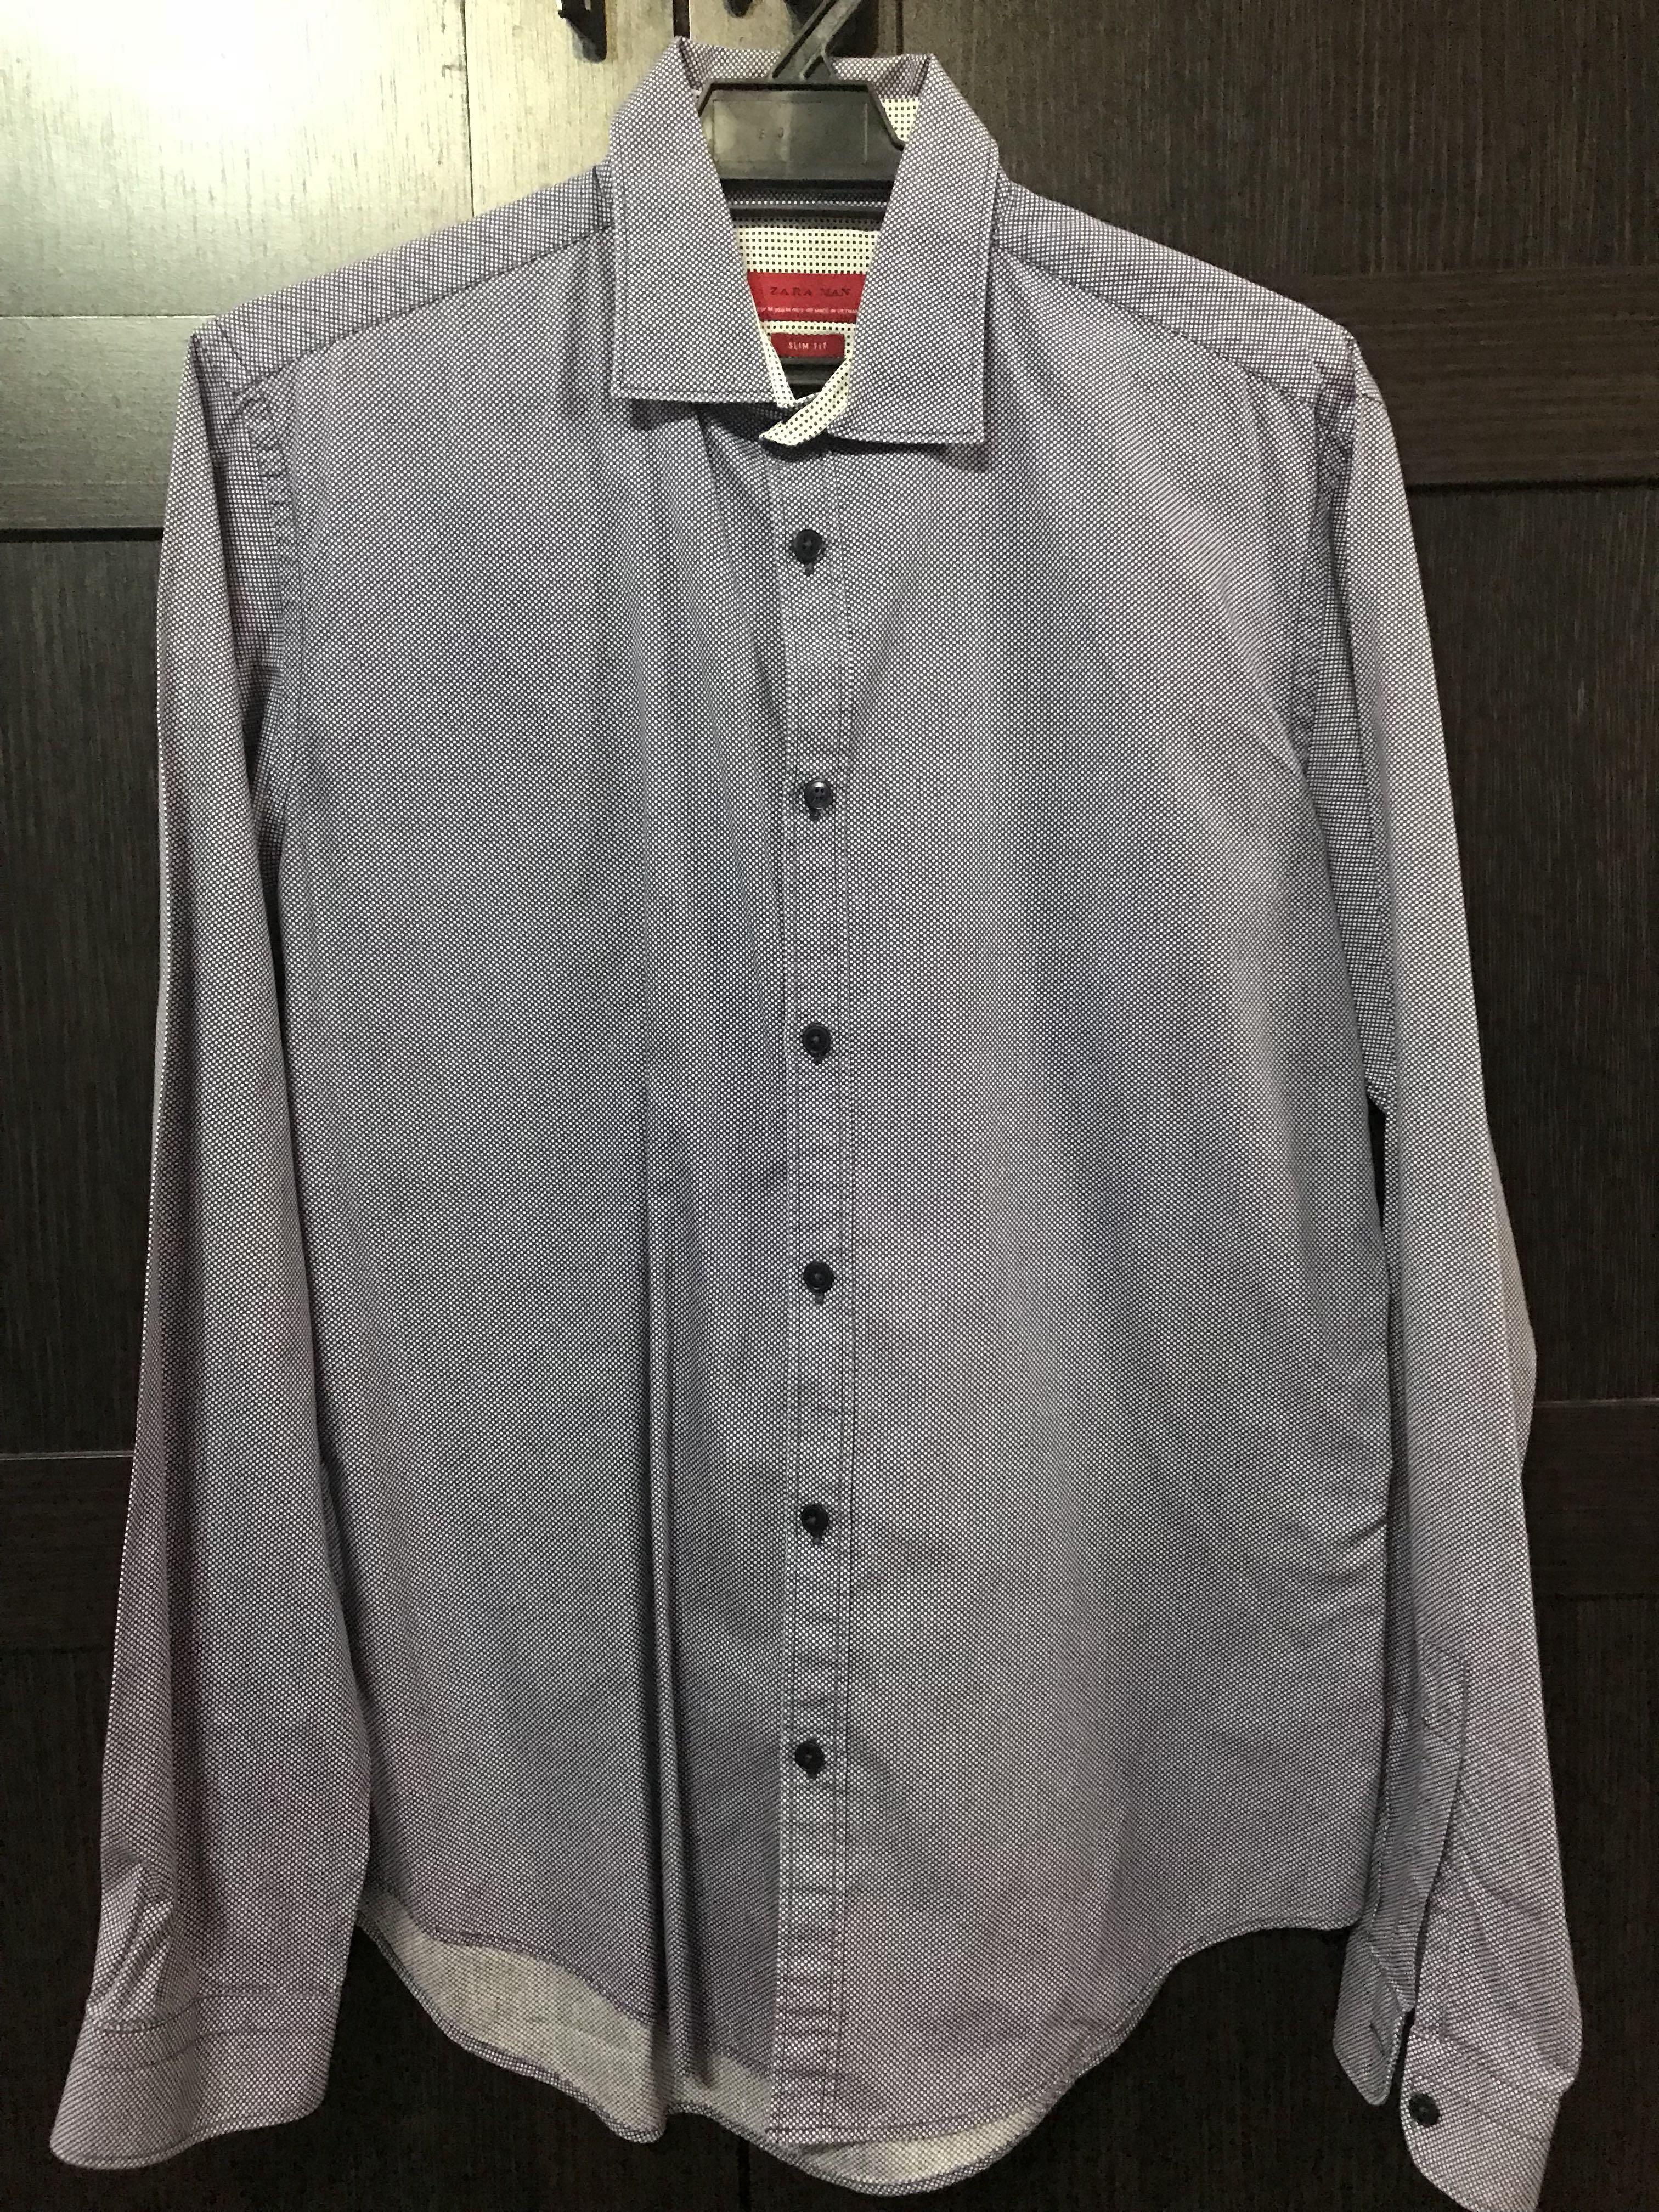 b67da258c6 ZARA MAN Shirt, Men's Fashion, Clothes, Tops on Carousell